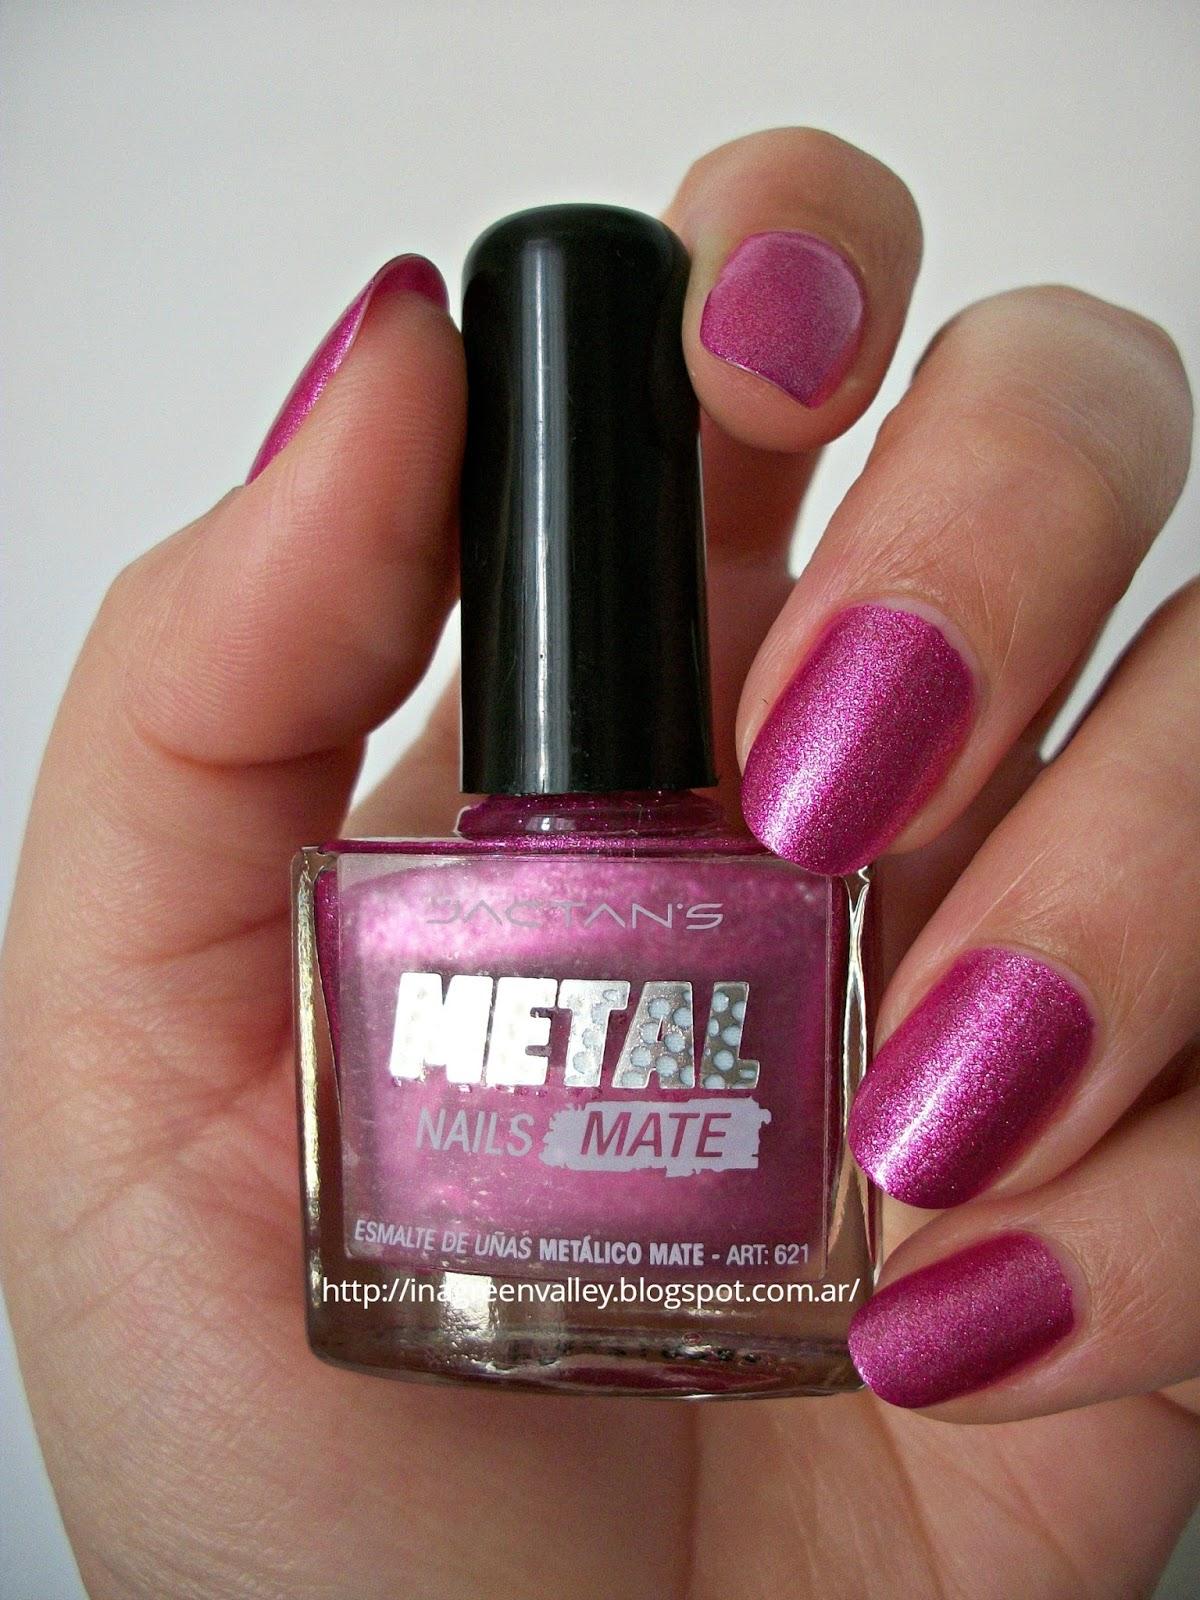 Grinvali: Reseña: Esmalte de uñas Metal Nails Mate - Jactans - 005 ...